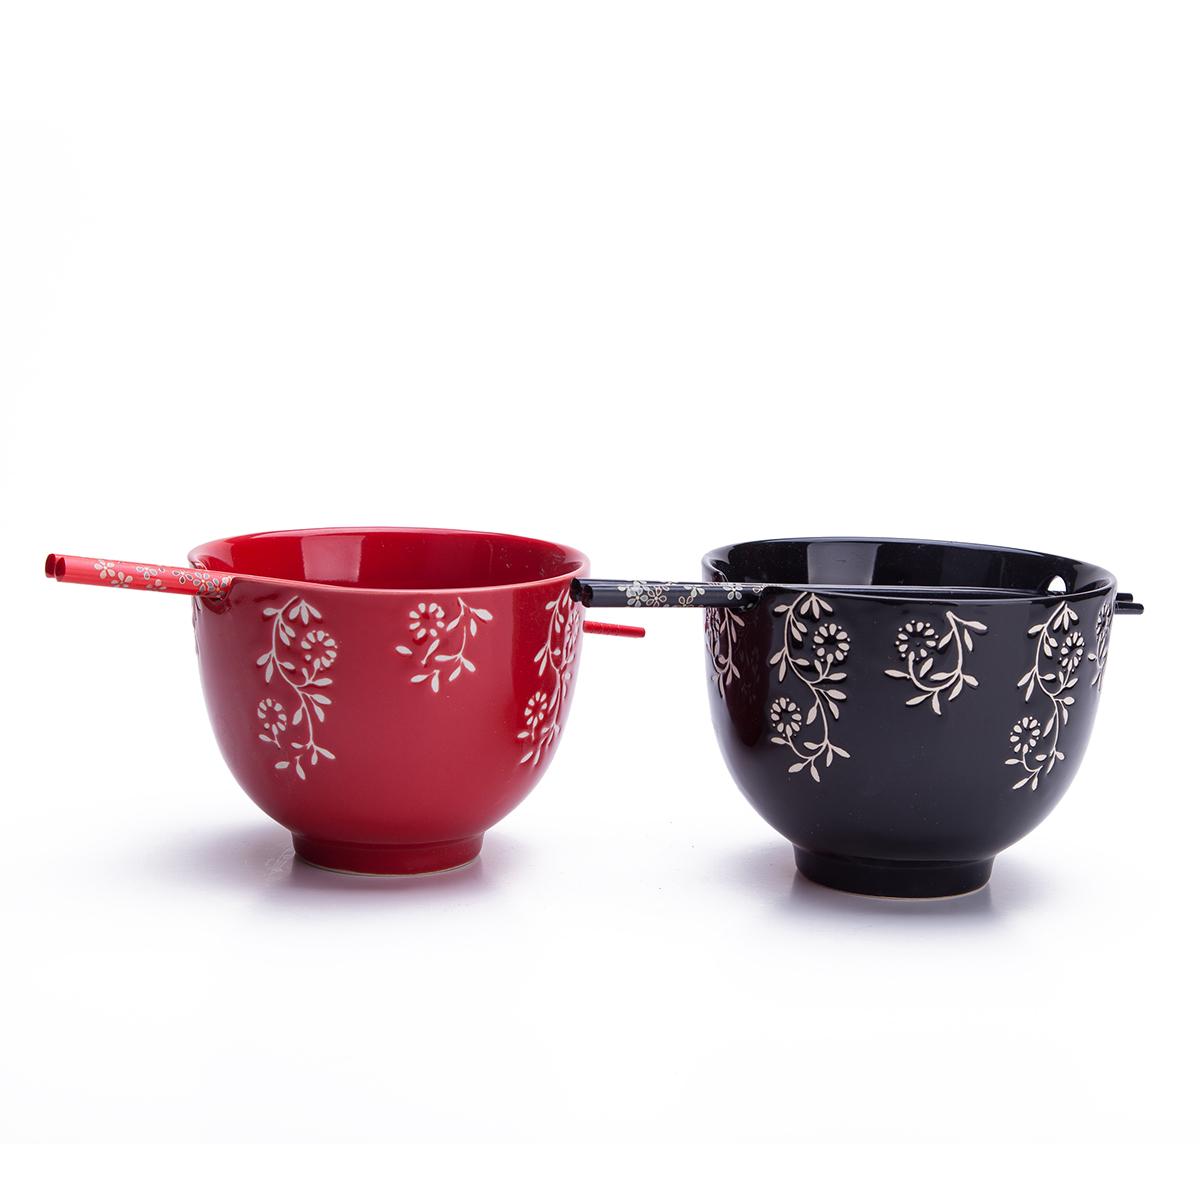 Zoom  sc 1 st  moriental.com & 2 Rice / Soup / Noodle Bowls u0026 2 Paris Of Chopsticks Dinnerware Set ...